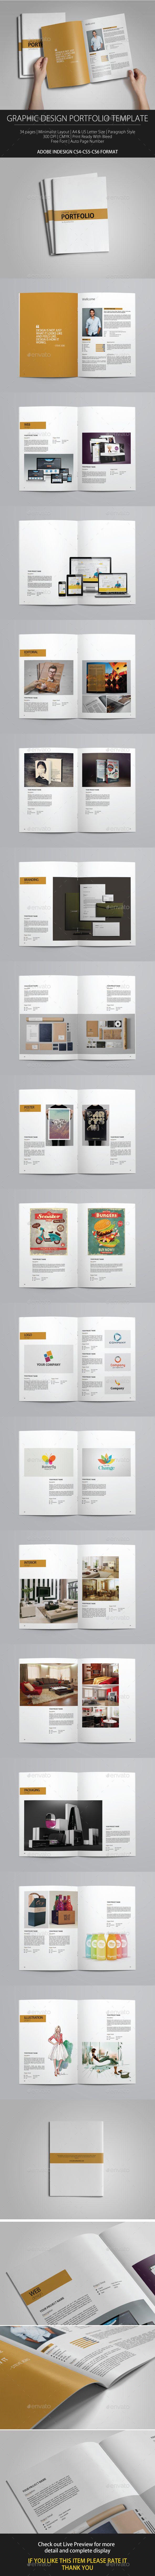 Graphic Design Portfolio Brochure Template InDesign INDD